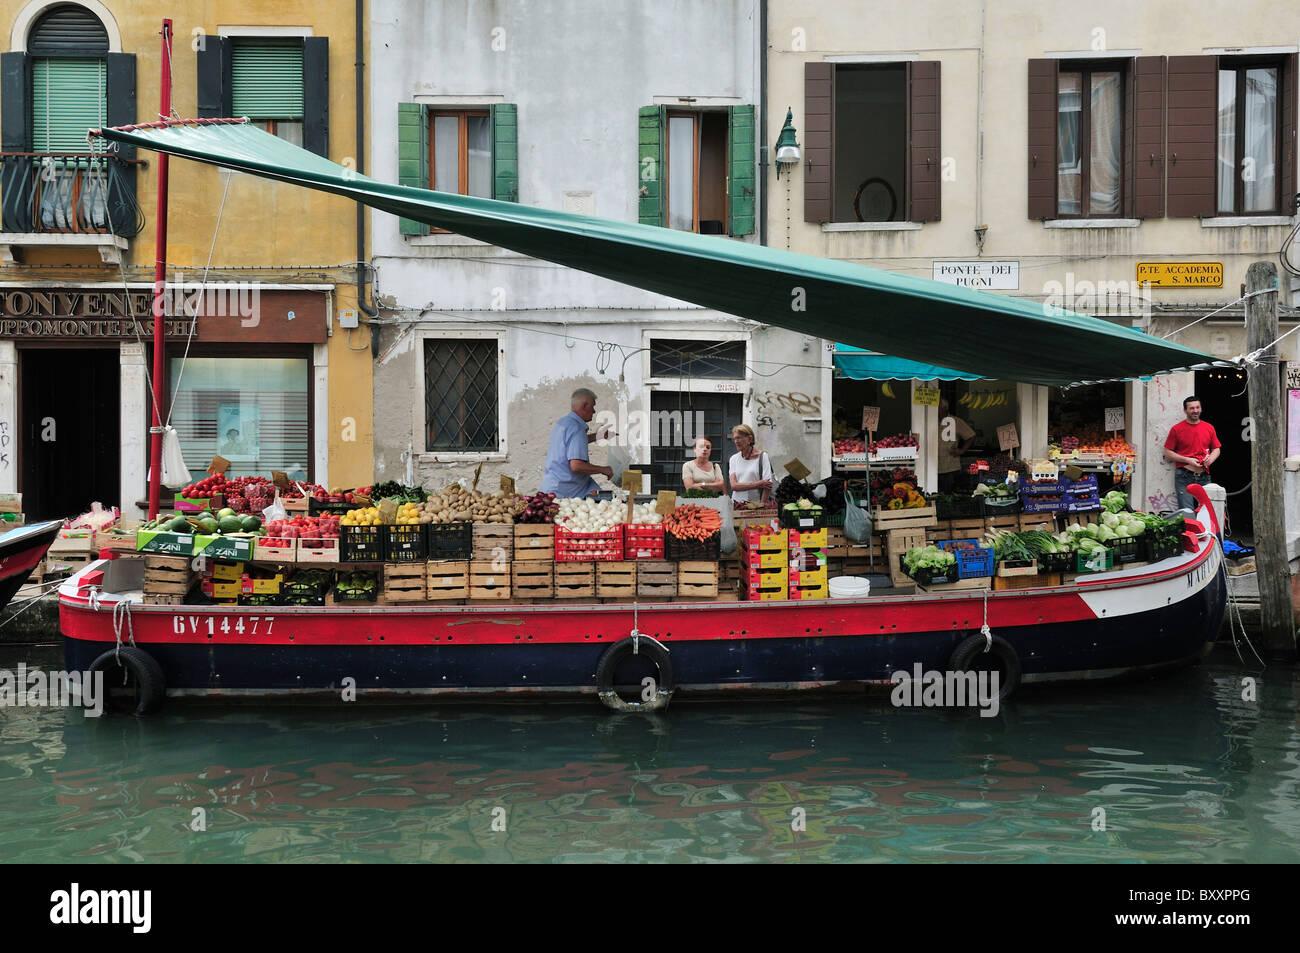 Venice. Italy. Fruit & Veg Barge on Rio San Barnaba / Piazza San Barnaba. - Stock Image